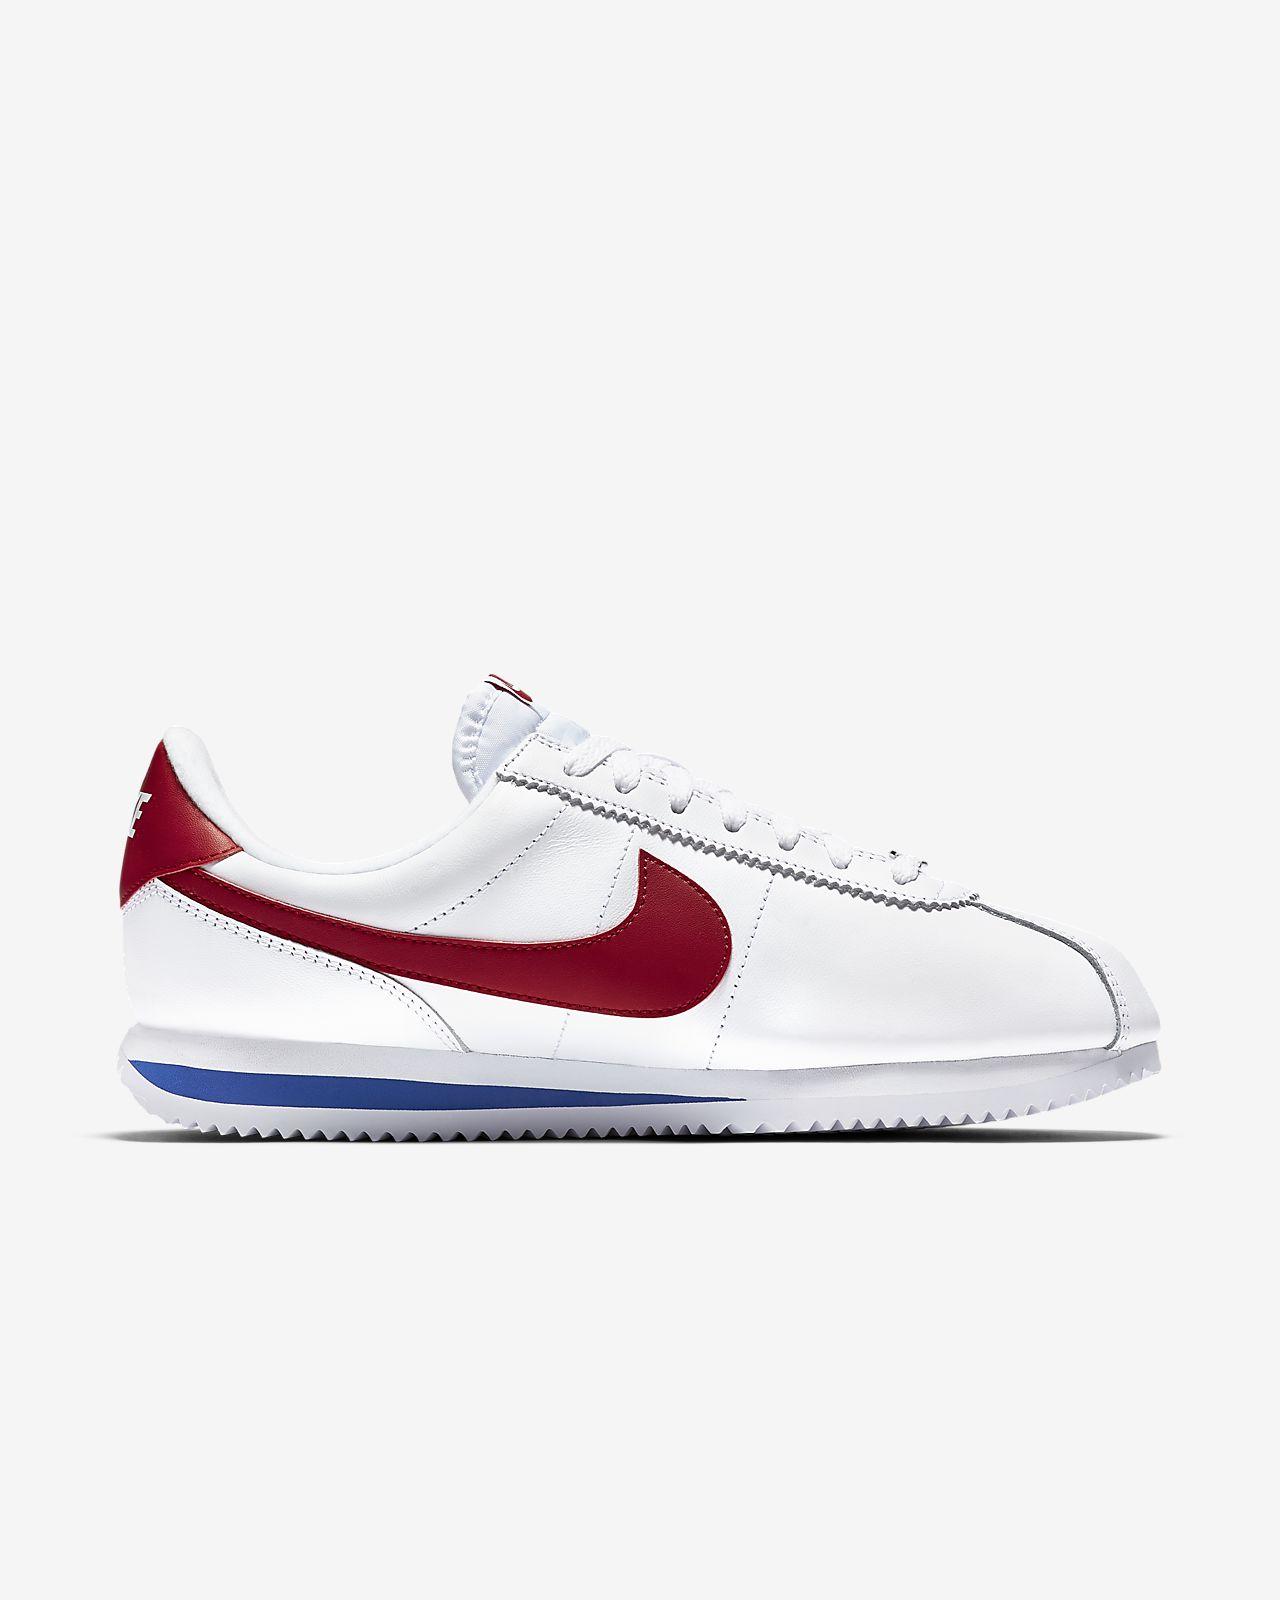 ca40ca29597c6 Nike Cortez Basic Leather OG Men s Shoe. Nike.com